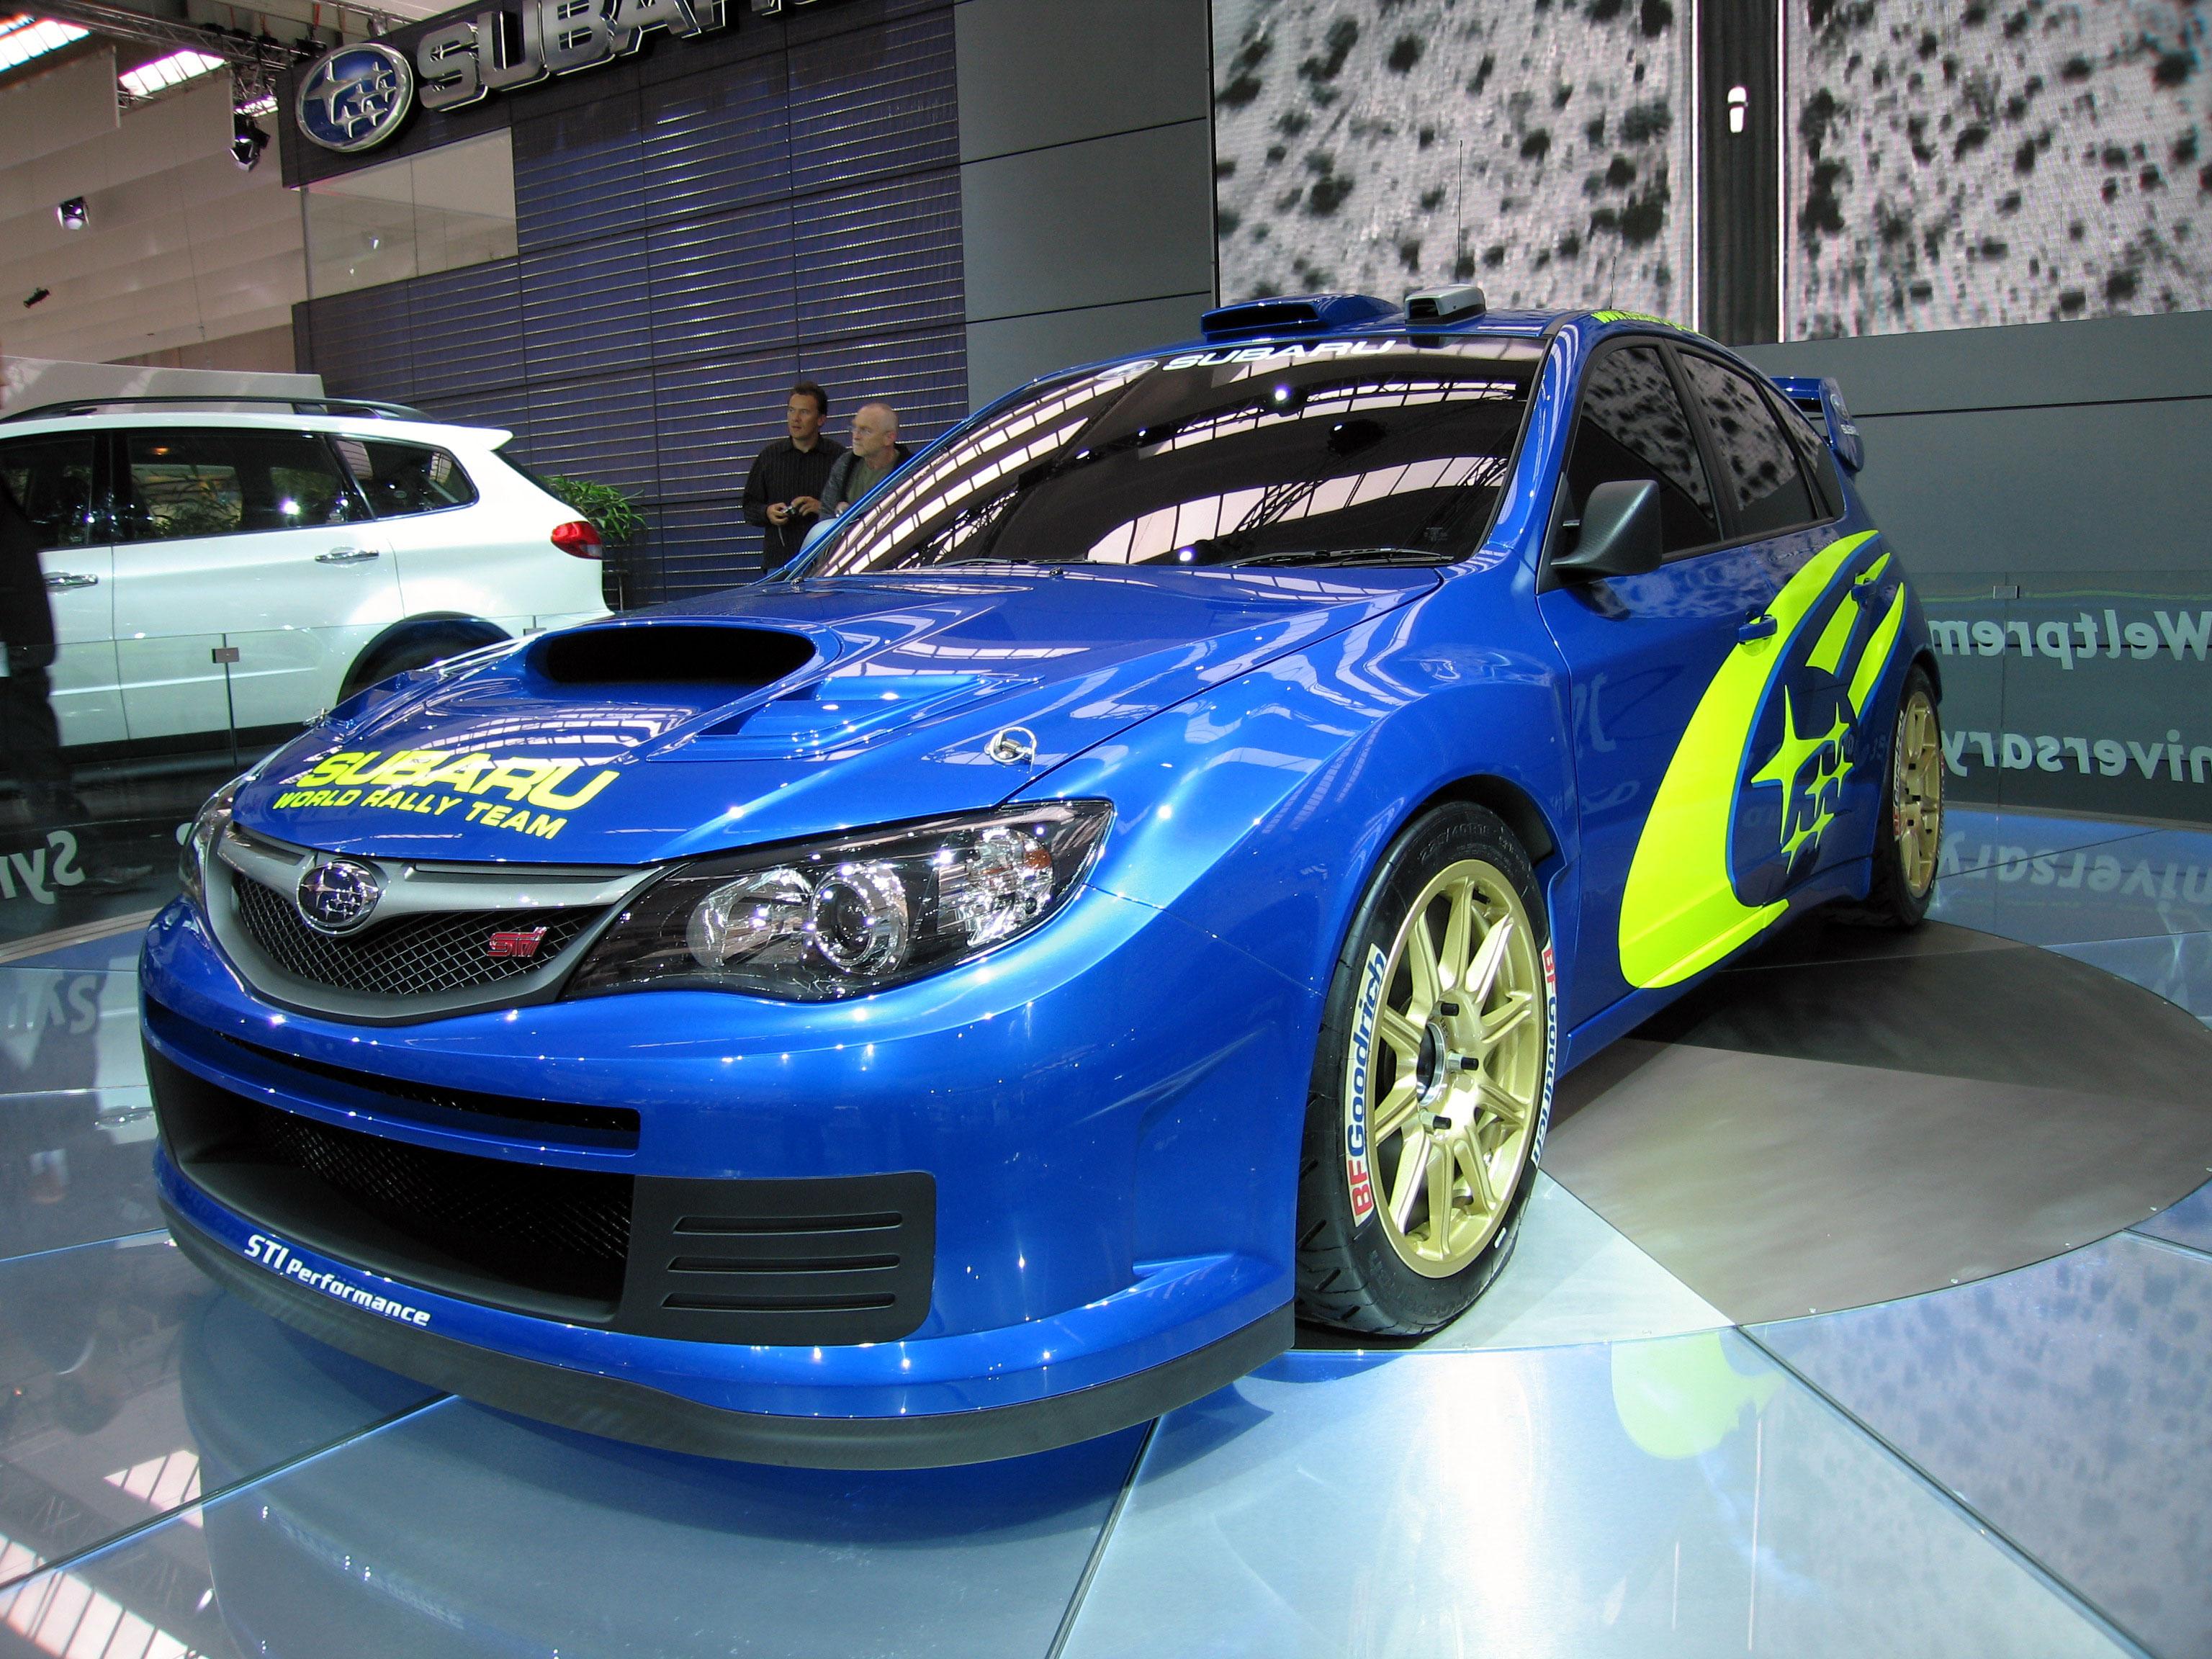 File:Subaru Impreza WRX III.jpg - Wikimedia Commons